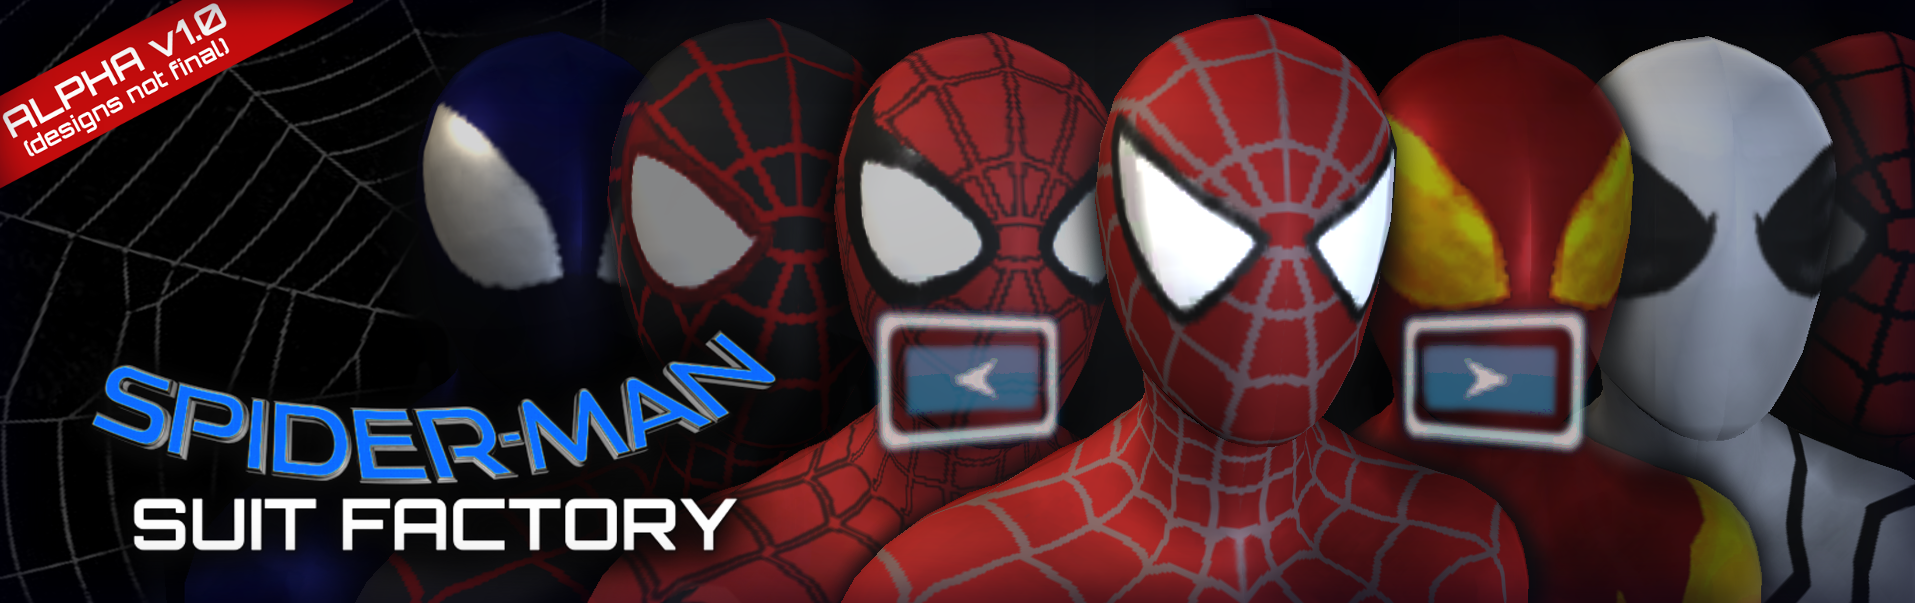 Spider-Man: Suit Factory